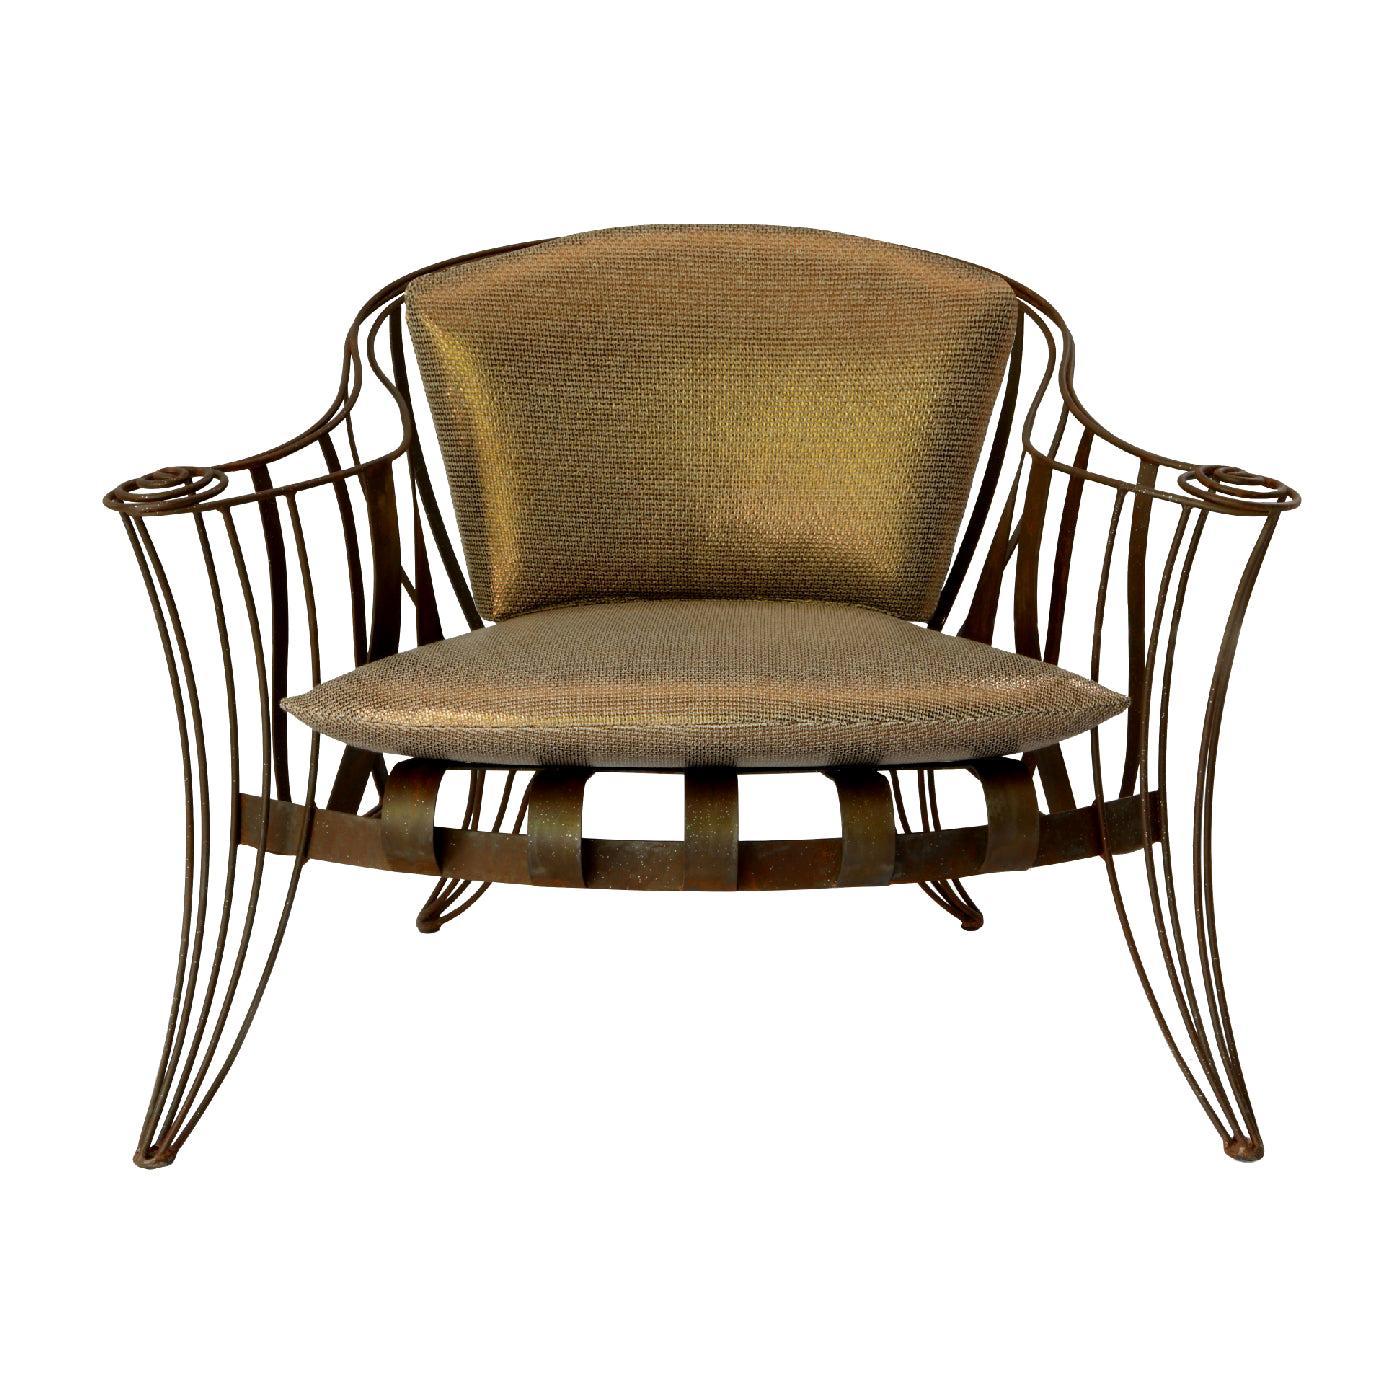 Opus Garden Armchair by Carlo Rampazzi